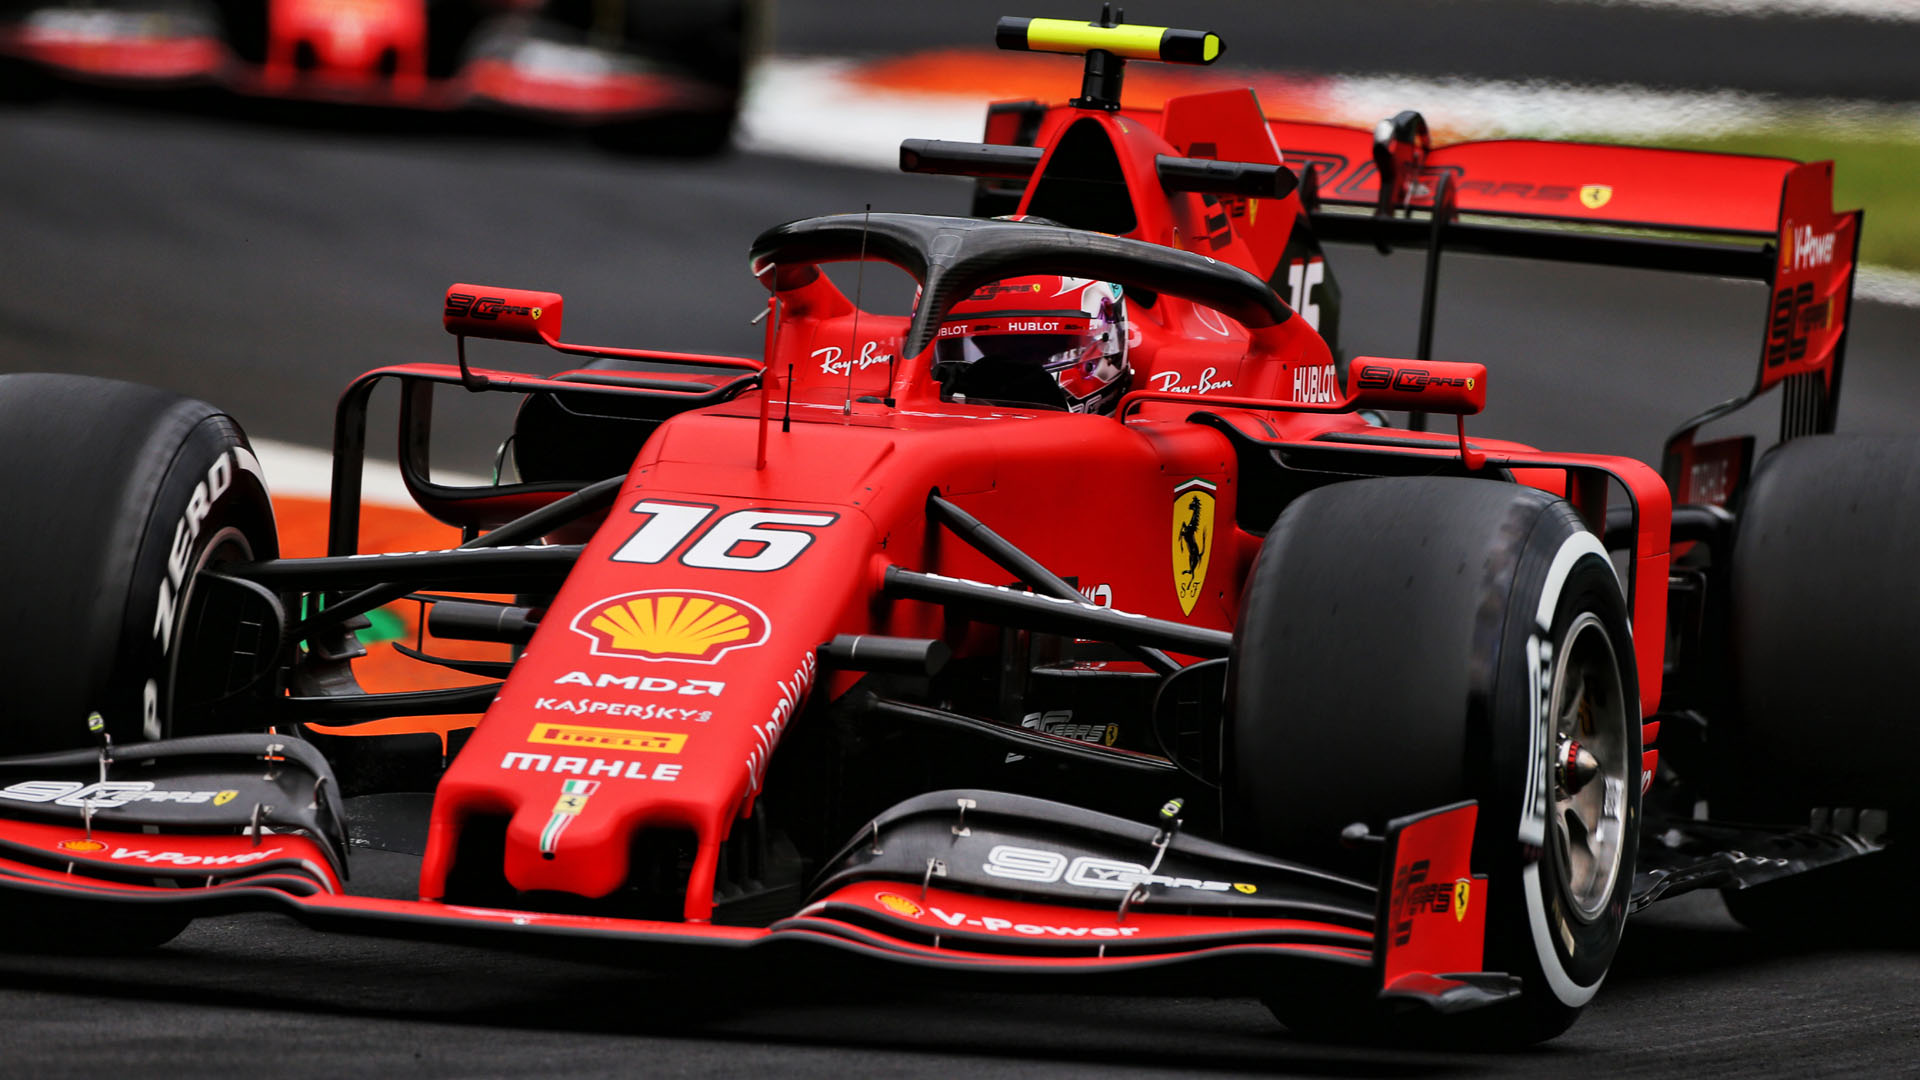 Italian Grand Prix 2019 Fp2 Report Leclerc Leads Hamilton In Second Practice As Rain Continues At Monza Formula 1